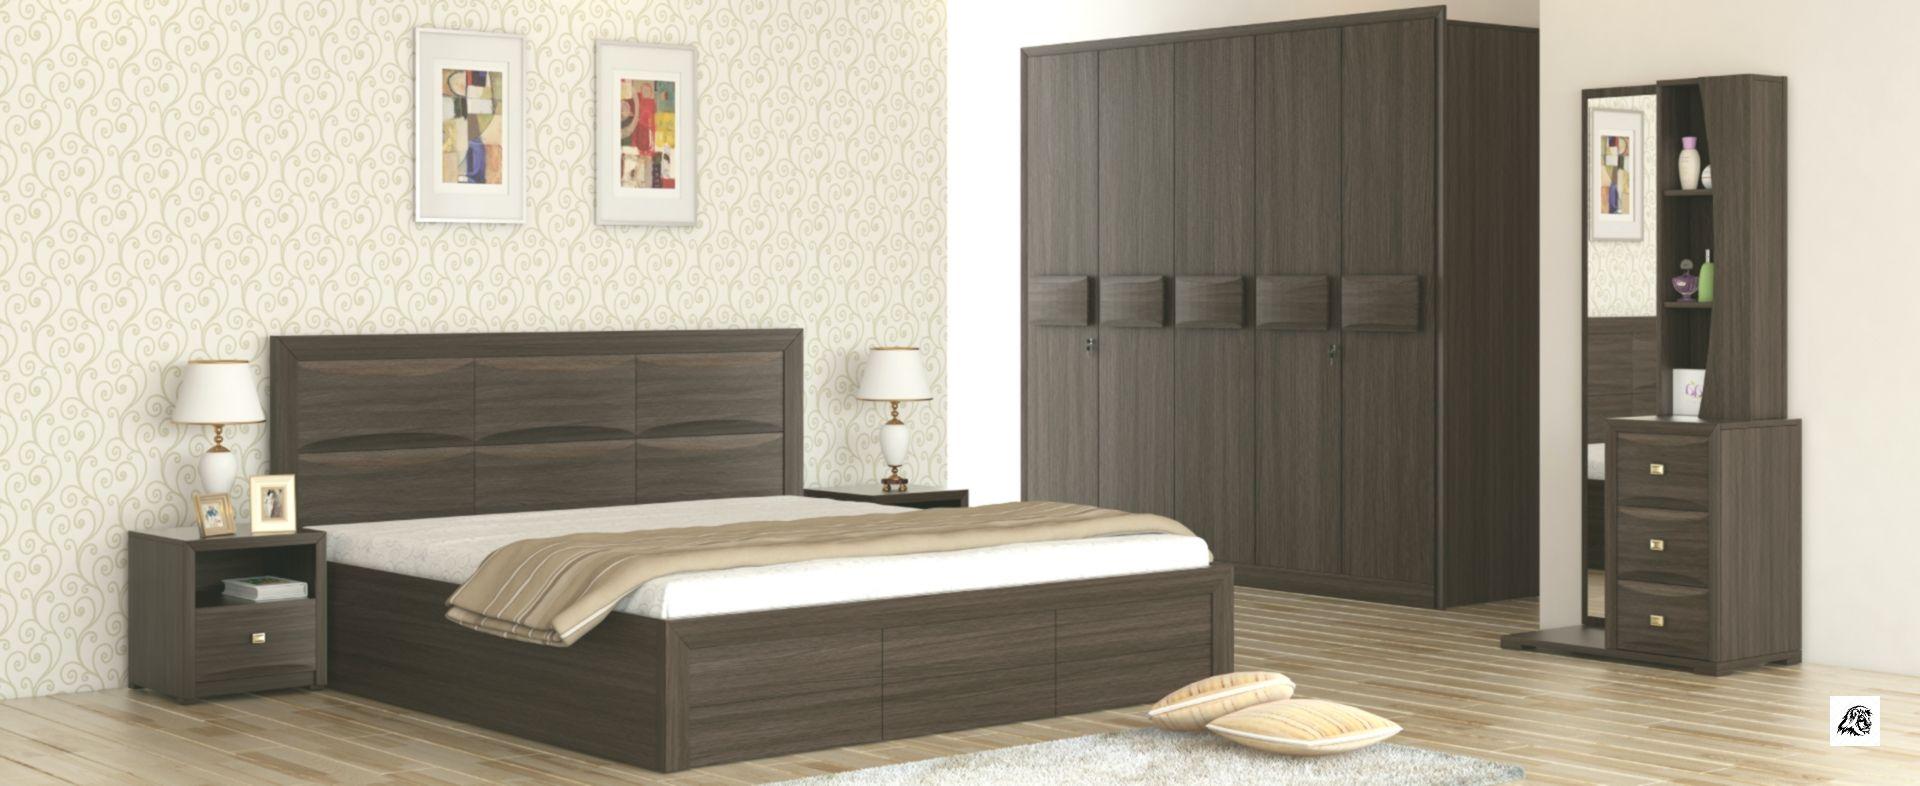 31 Bedroom Furniture Design Amazing Bedroom Ideas 2019 Bedroom Modella Club Bedroom Furniture Design Furniture Sets Design Bedroom Set Designs Bedroom set with wardrobe